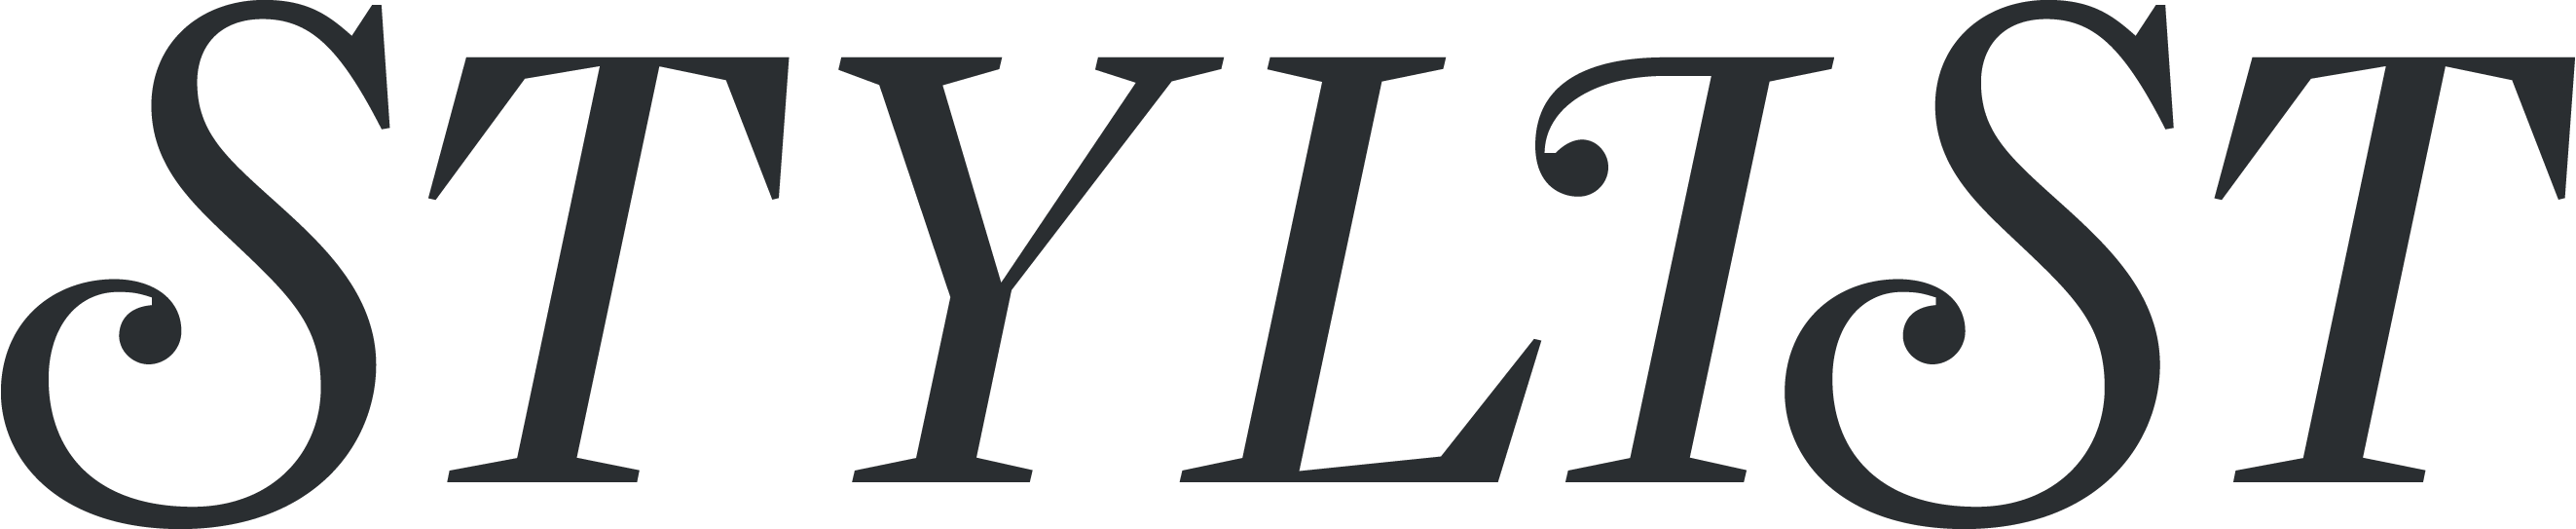 Stylist magazine logo